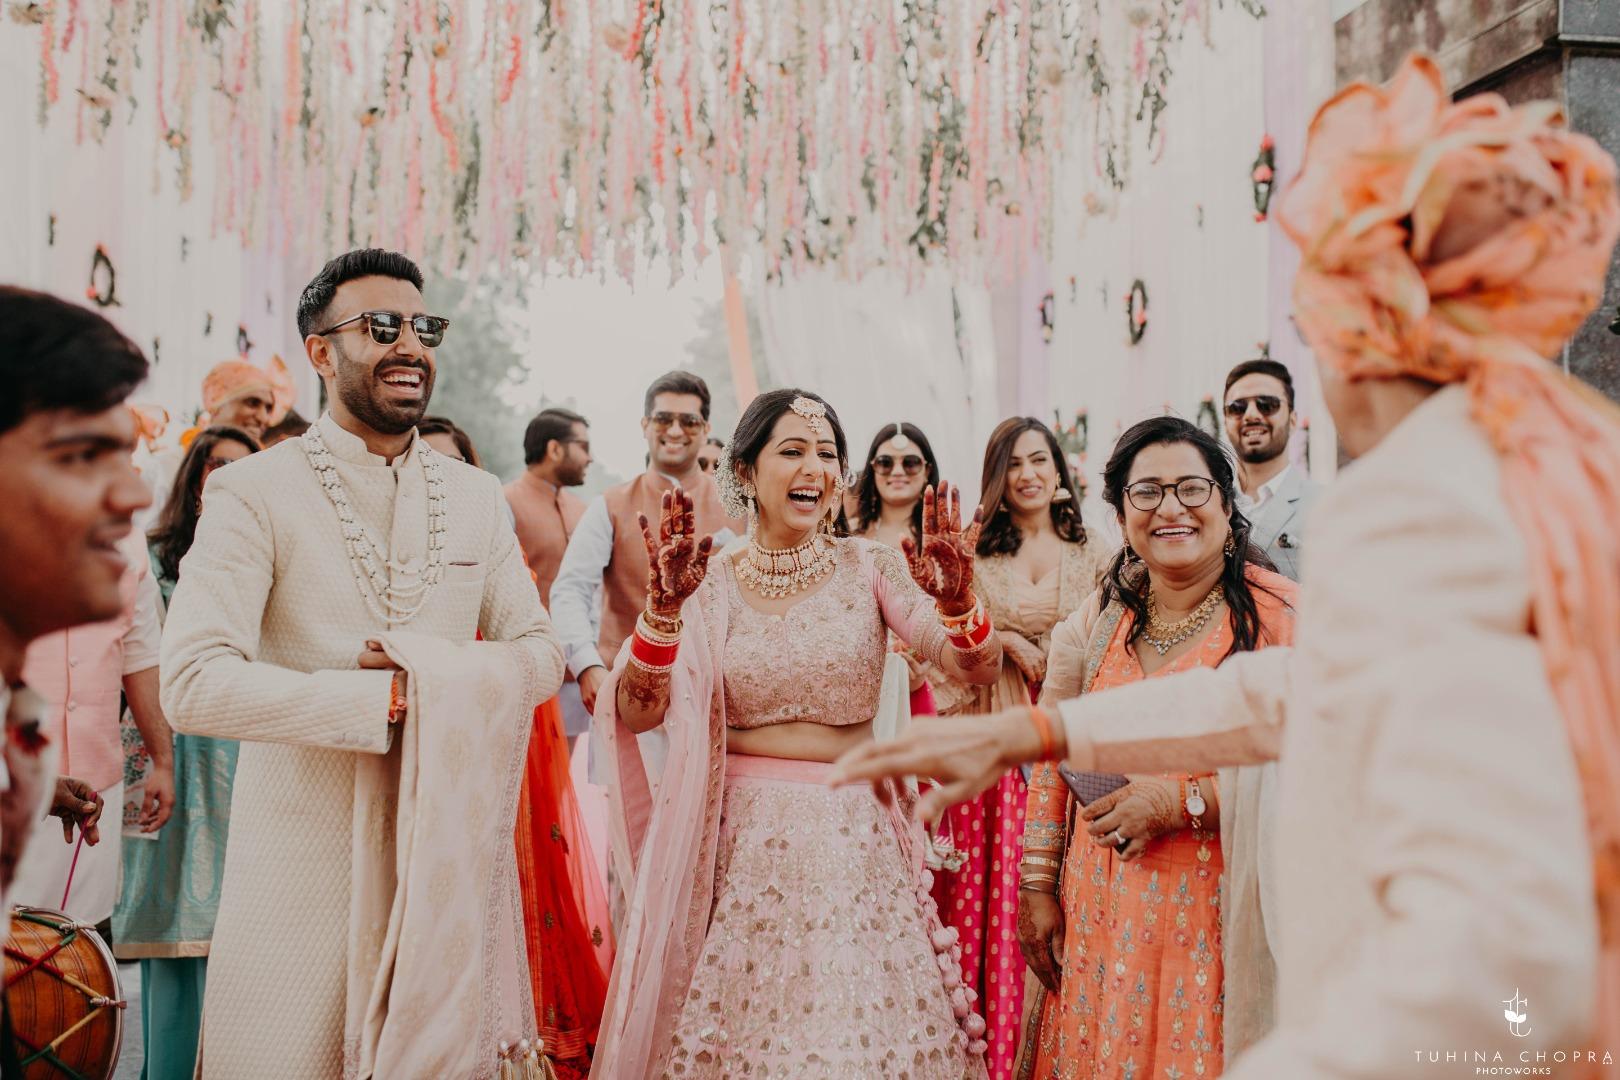 Candid capture of bride and groom dancing